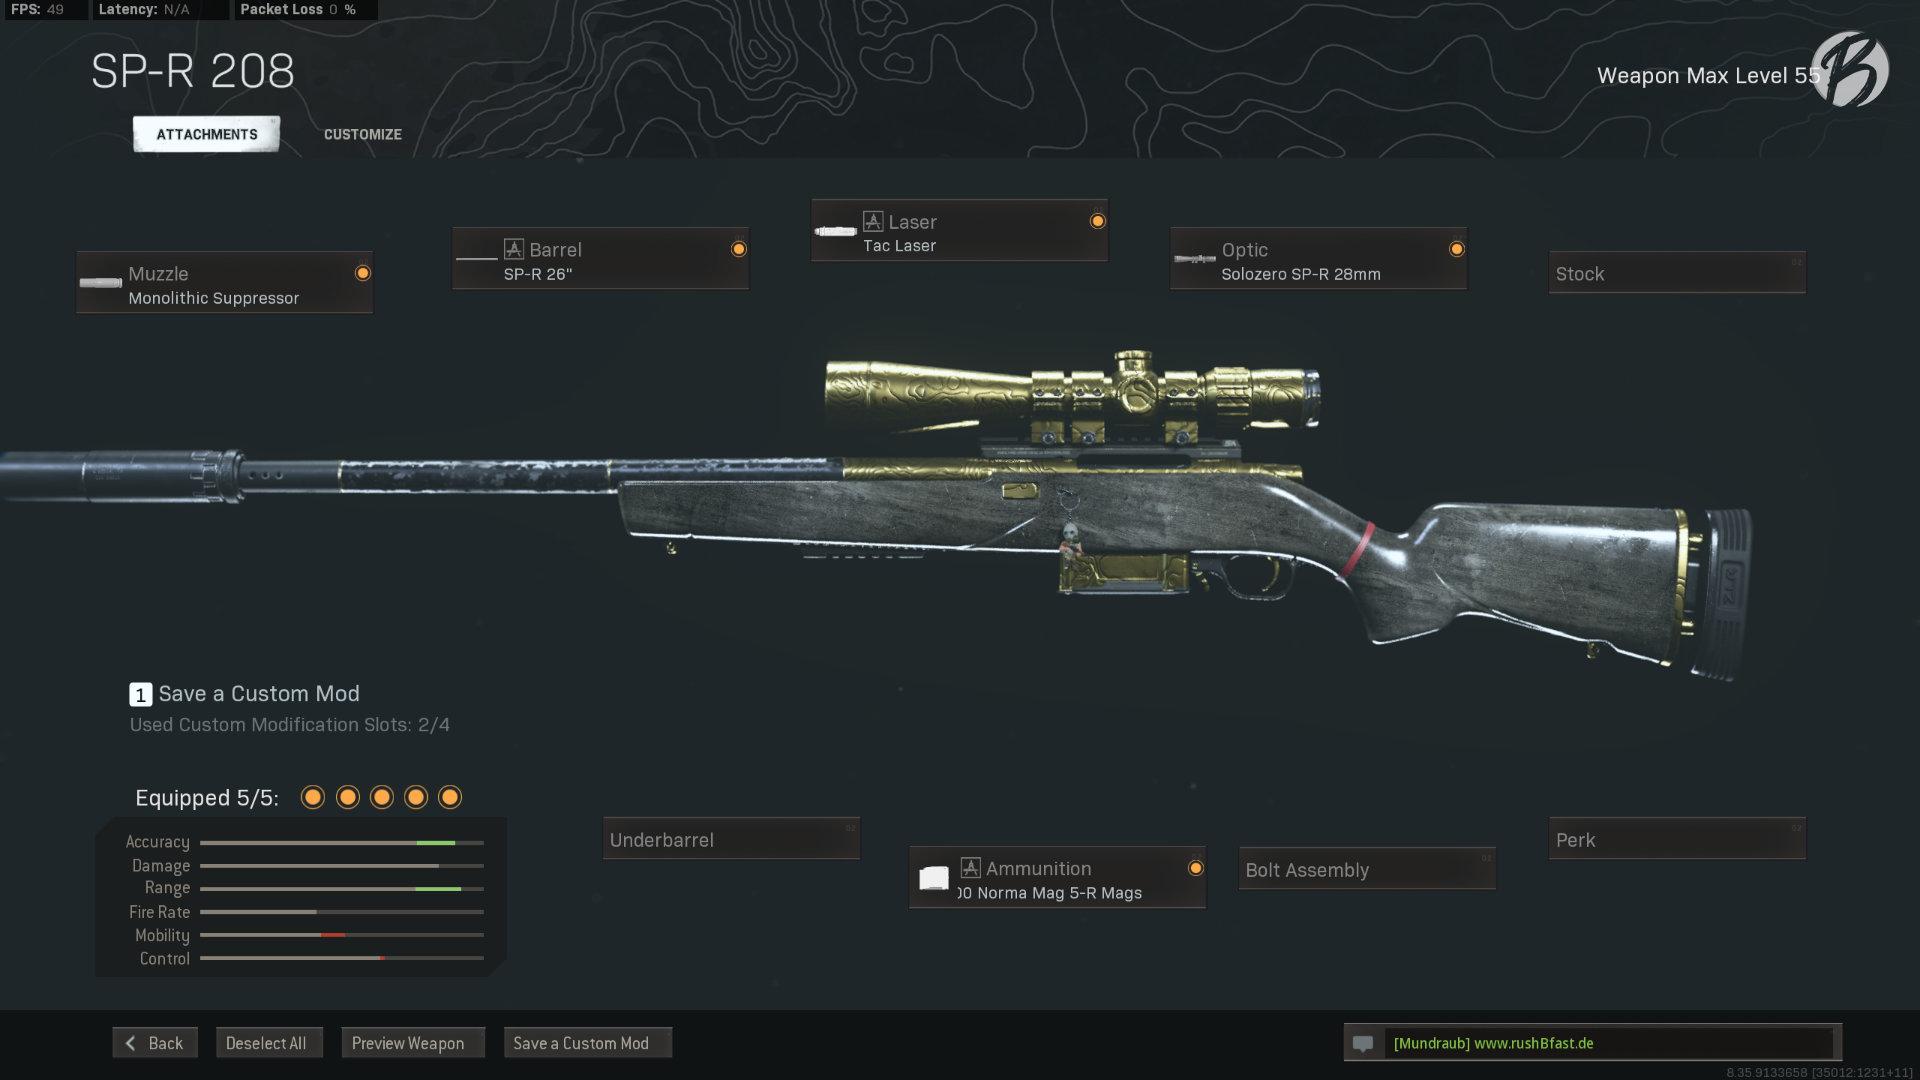 Call of Duty Warzone - Cold War Season 3 - SP-R 208